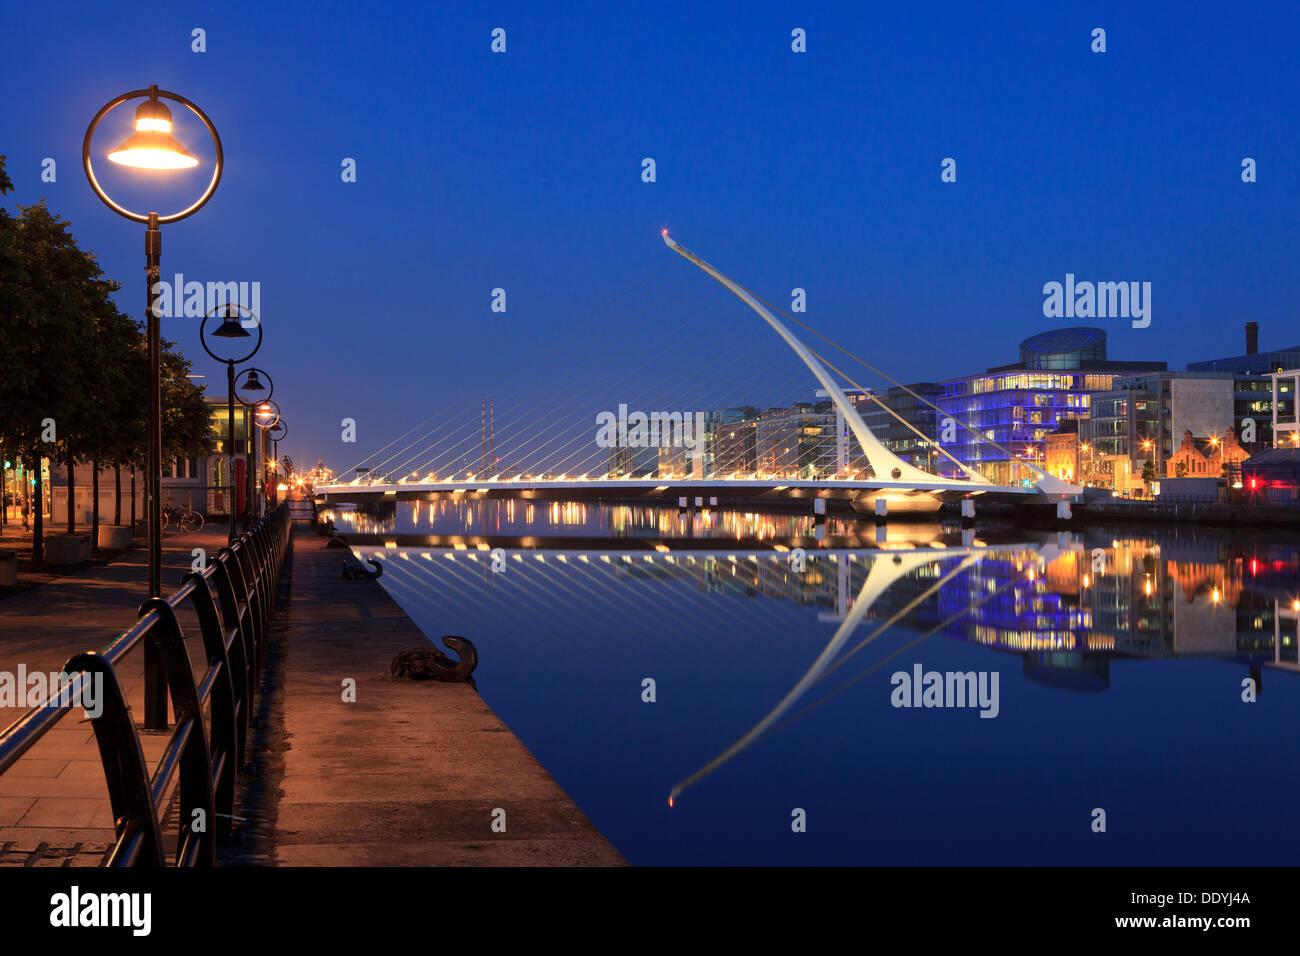 The Samuel Beckett Bridge (2009) by Santiago Calatrava in Dublin, Ireland - Stock Image